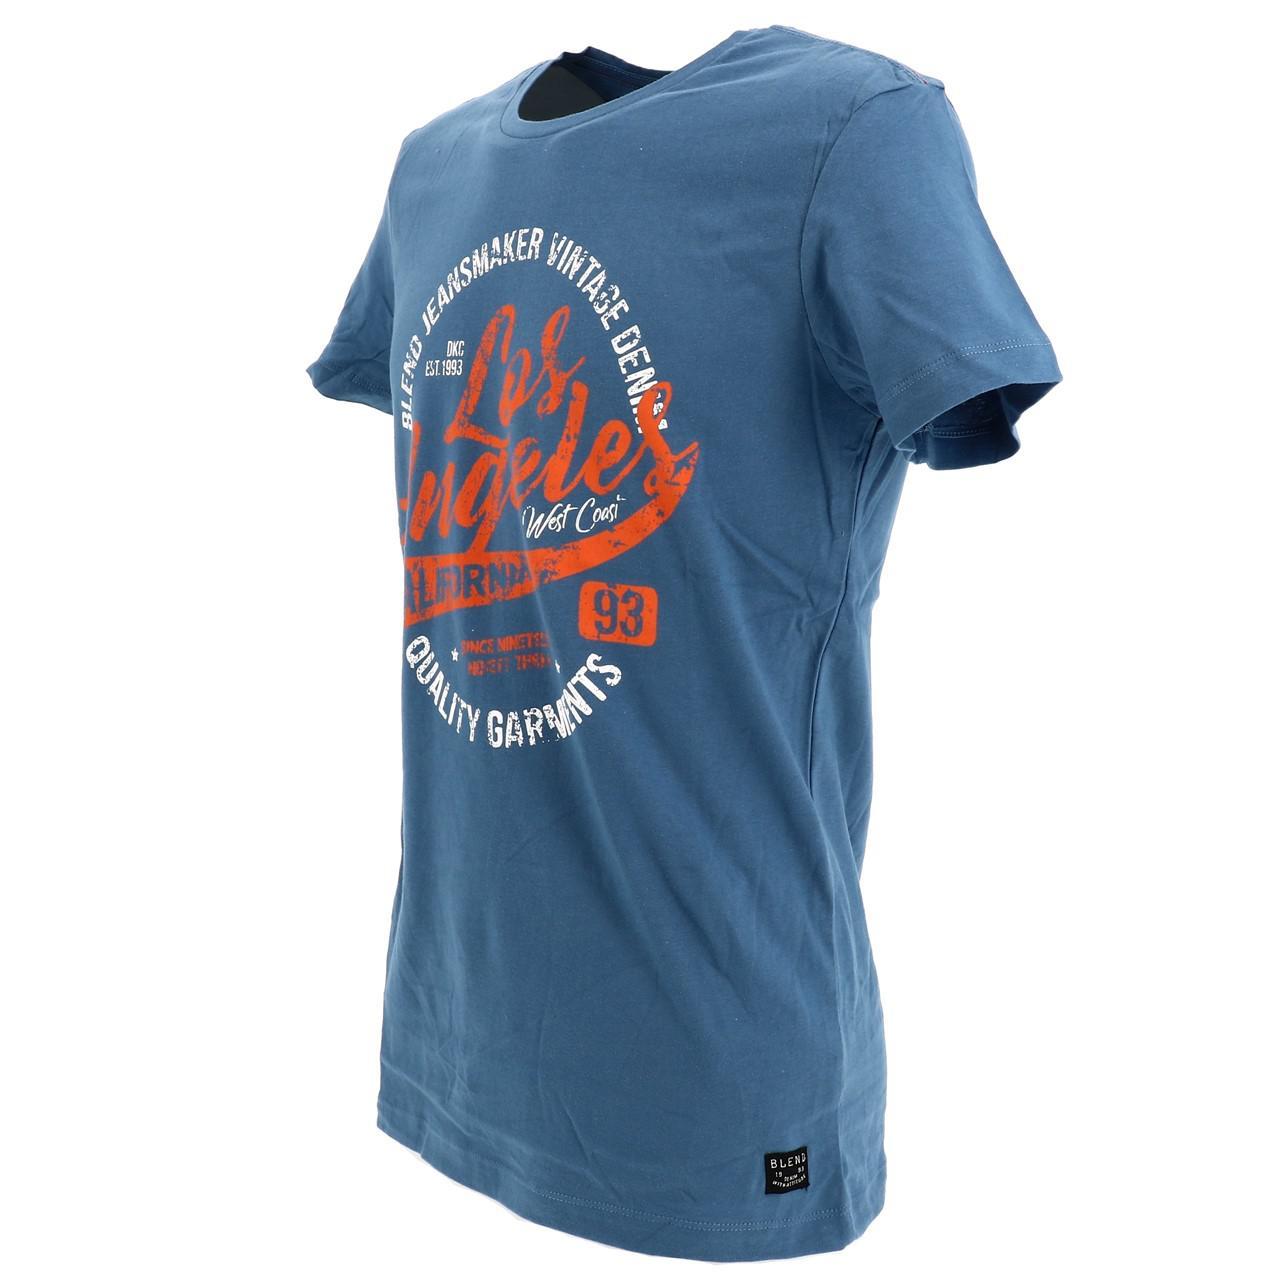 Short-Sleeve-T-Shirt-Blend-Angel-Coronet-Blue-Mc-Tee-Blue-18047-New thumbnail 4